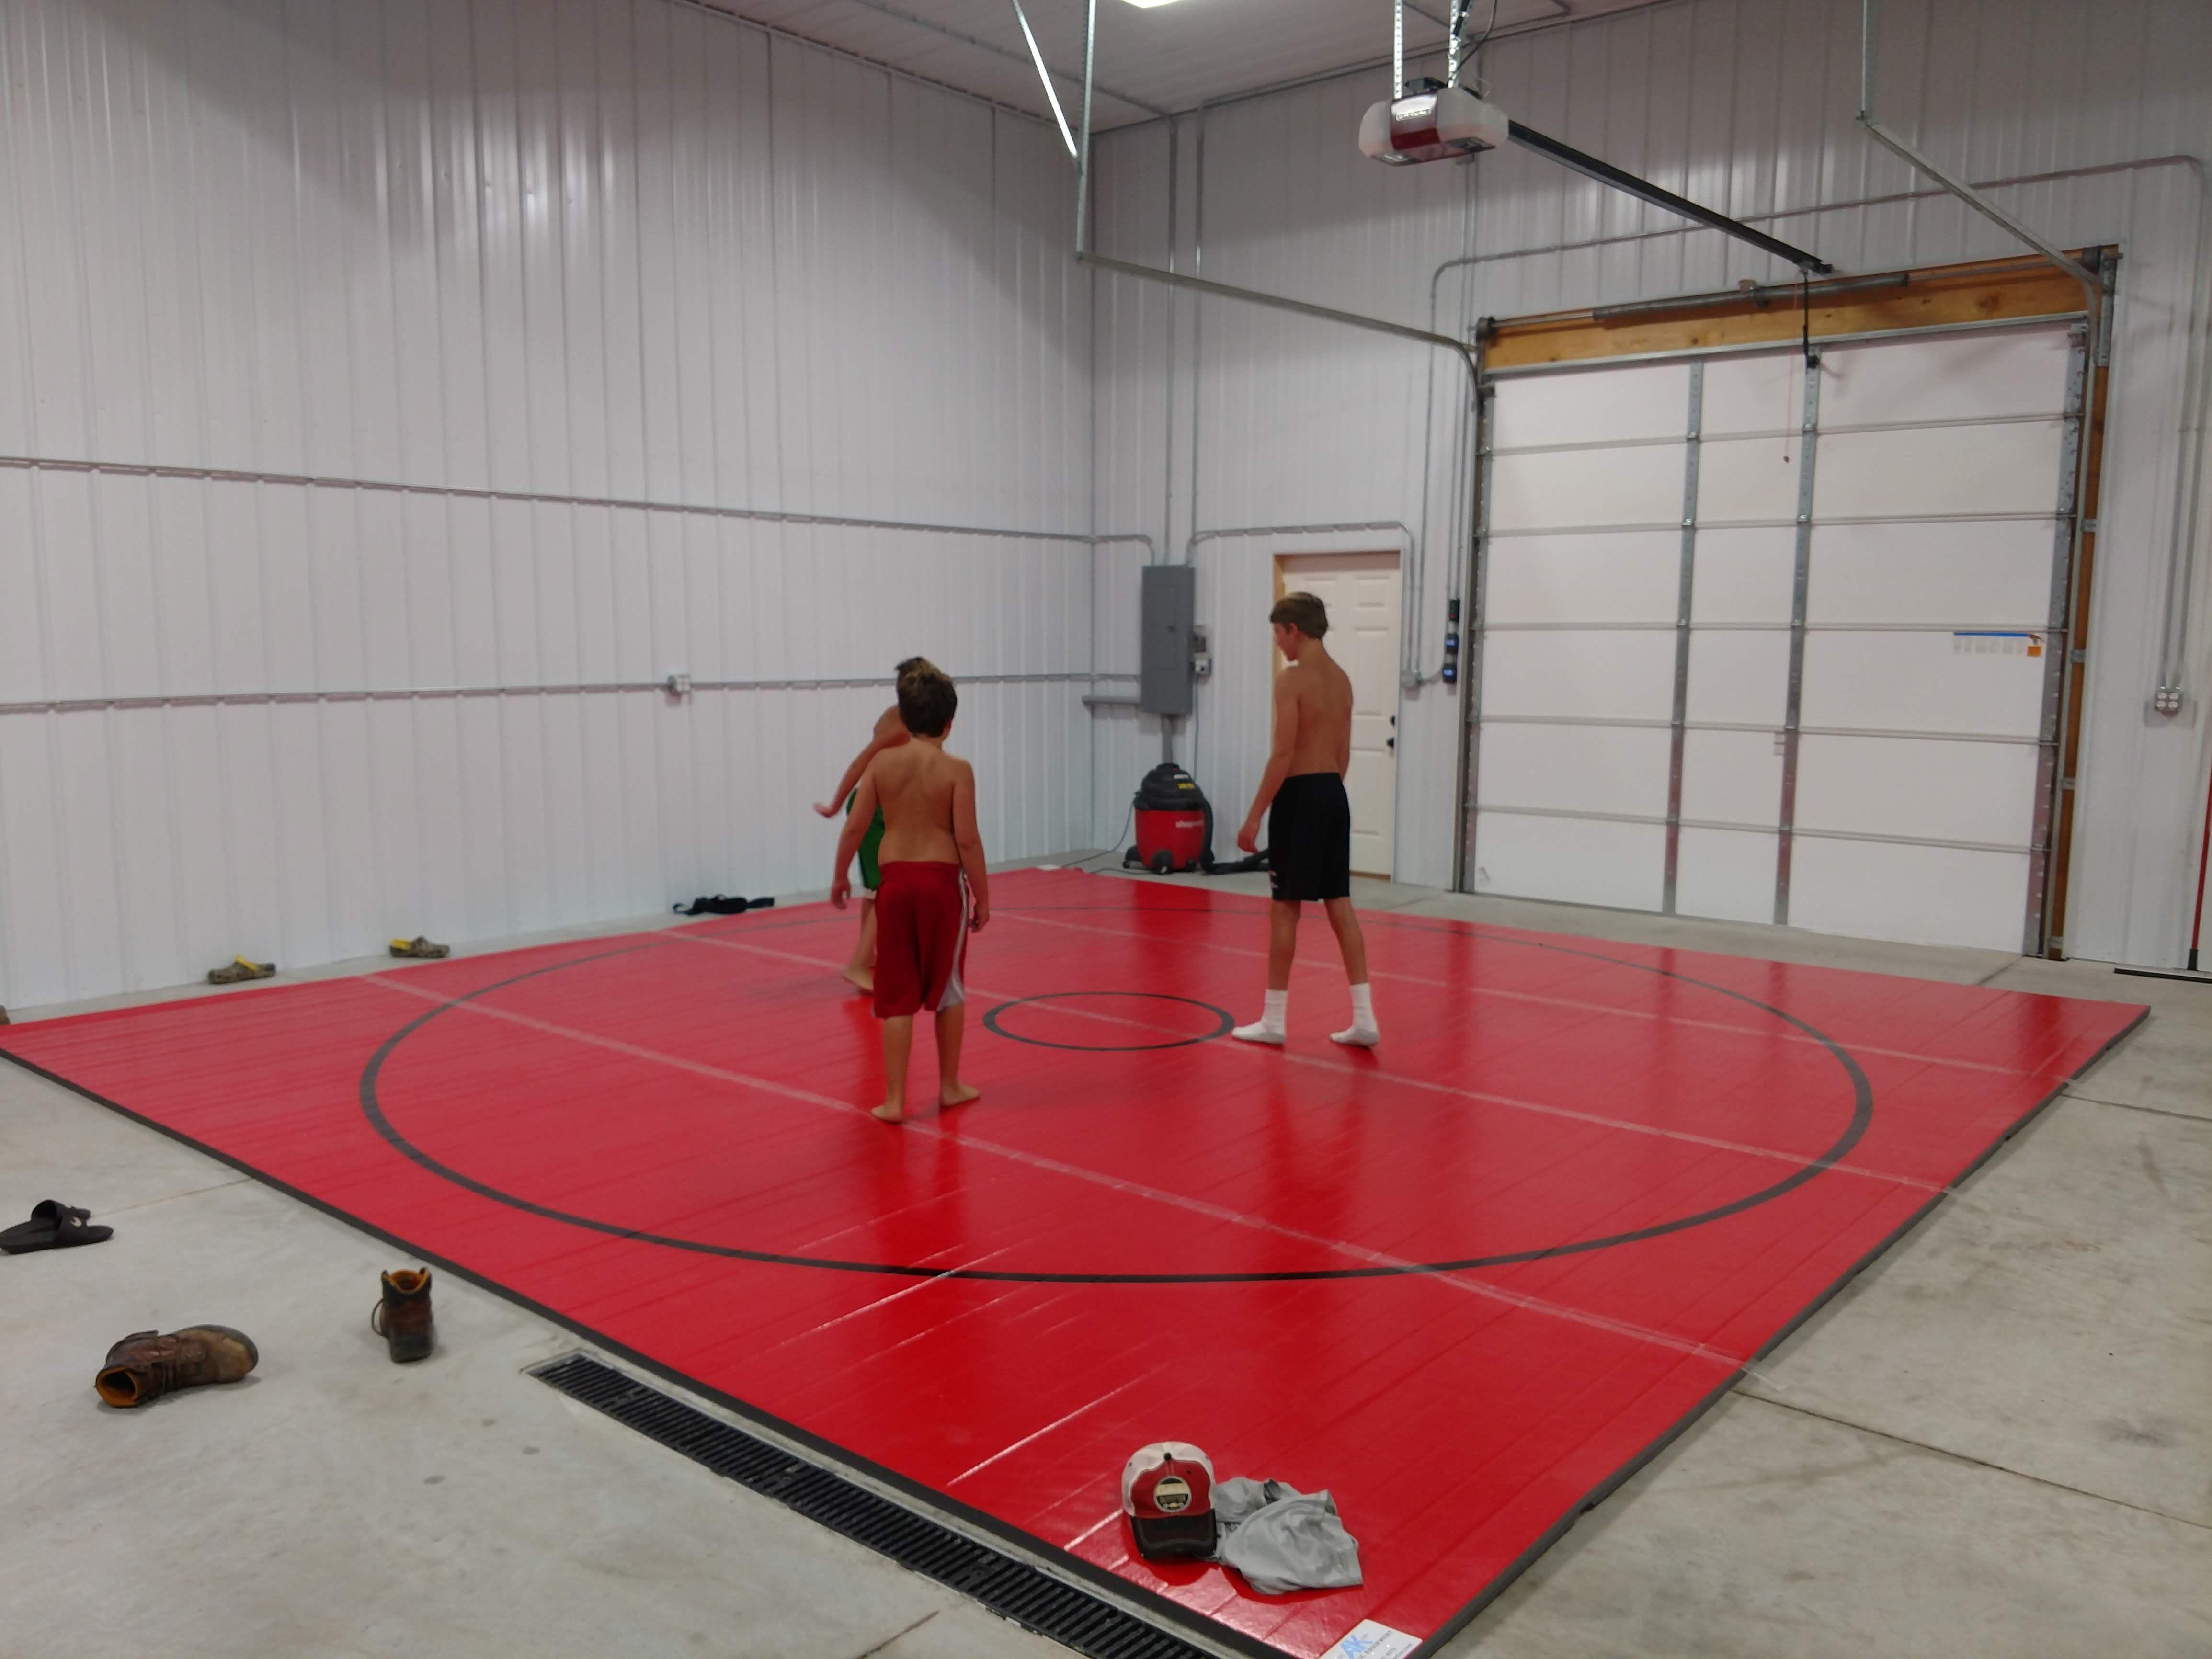 20 X 20 X 1 3 8 Roll Up Wrestling Mat In 2020 Wrestling Mat Garage Gym Jiu Jitsu Mats